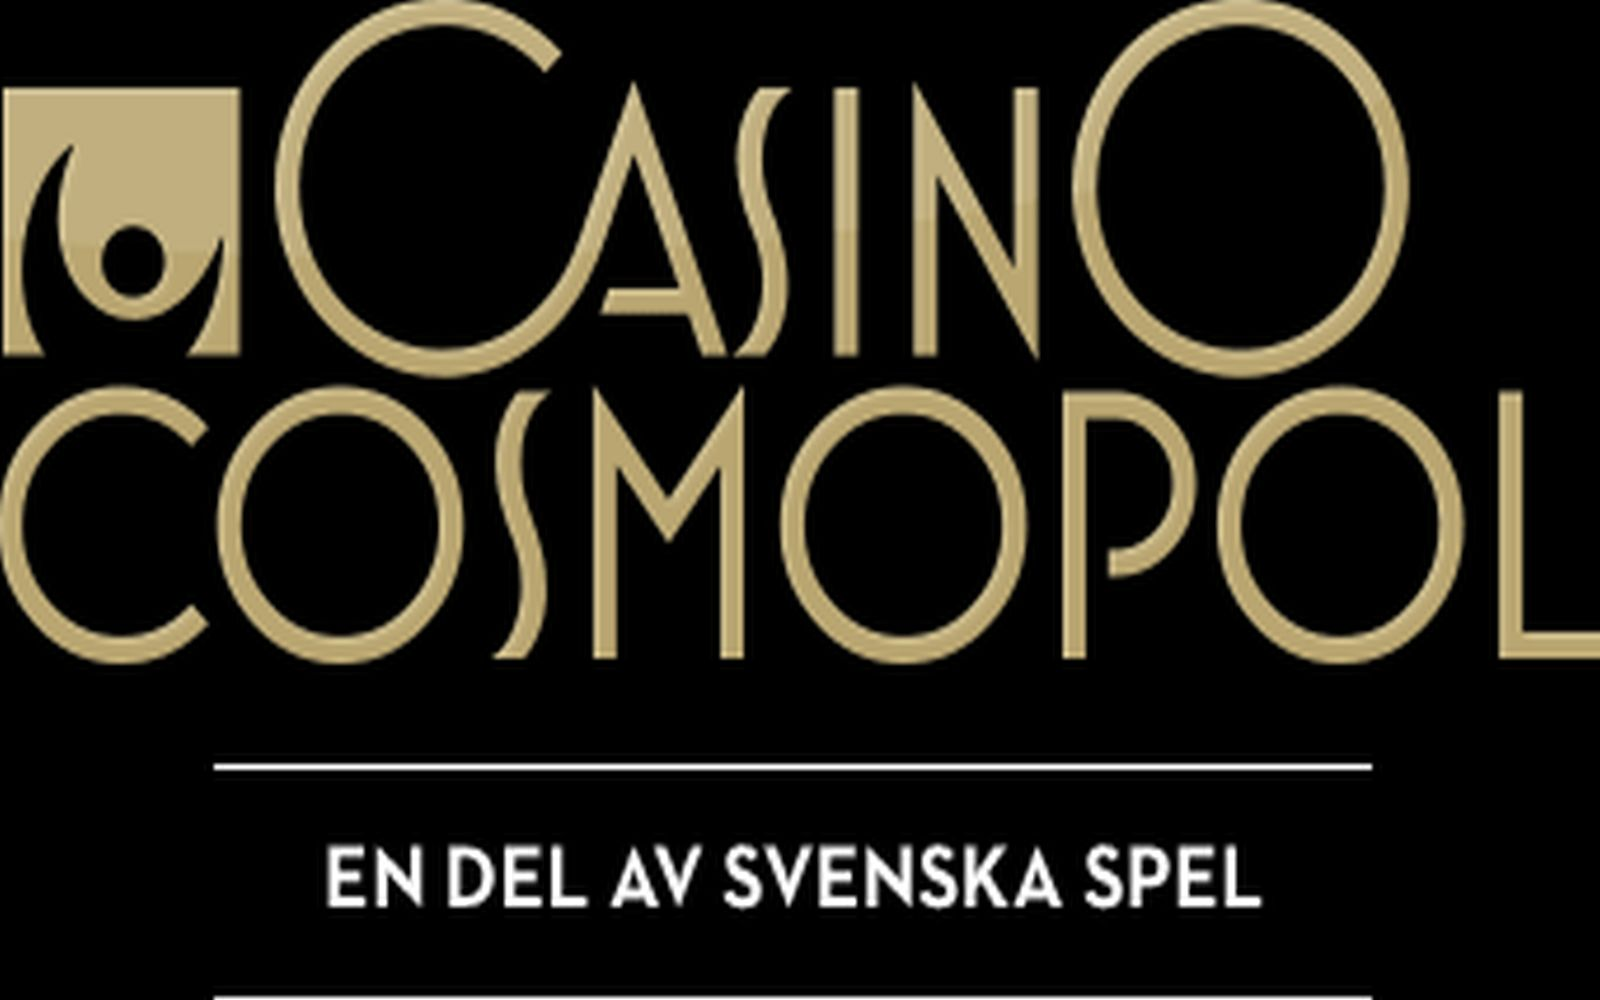 Cosmopol Gothenburg